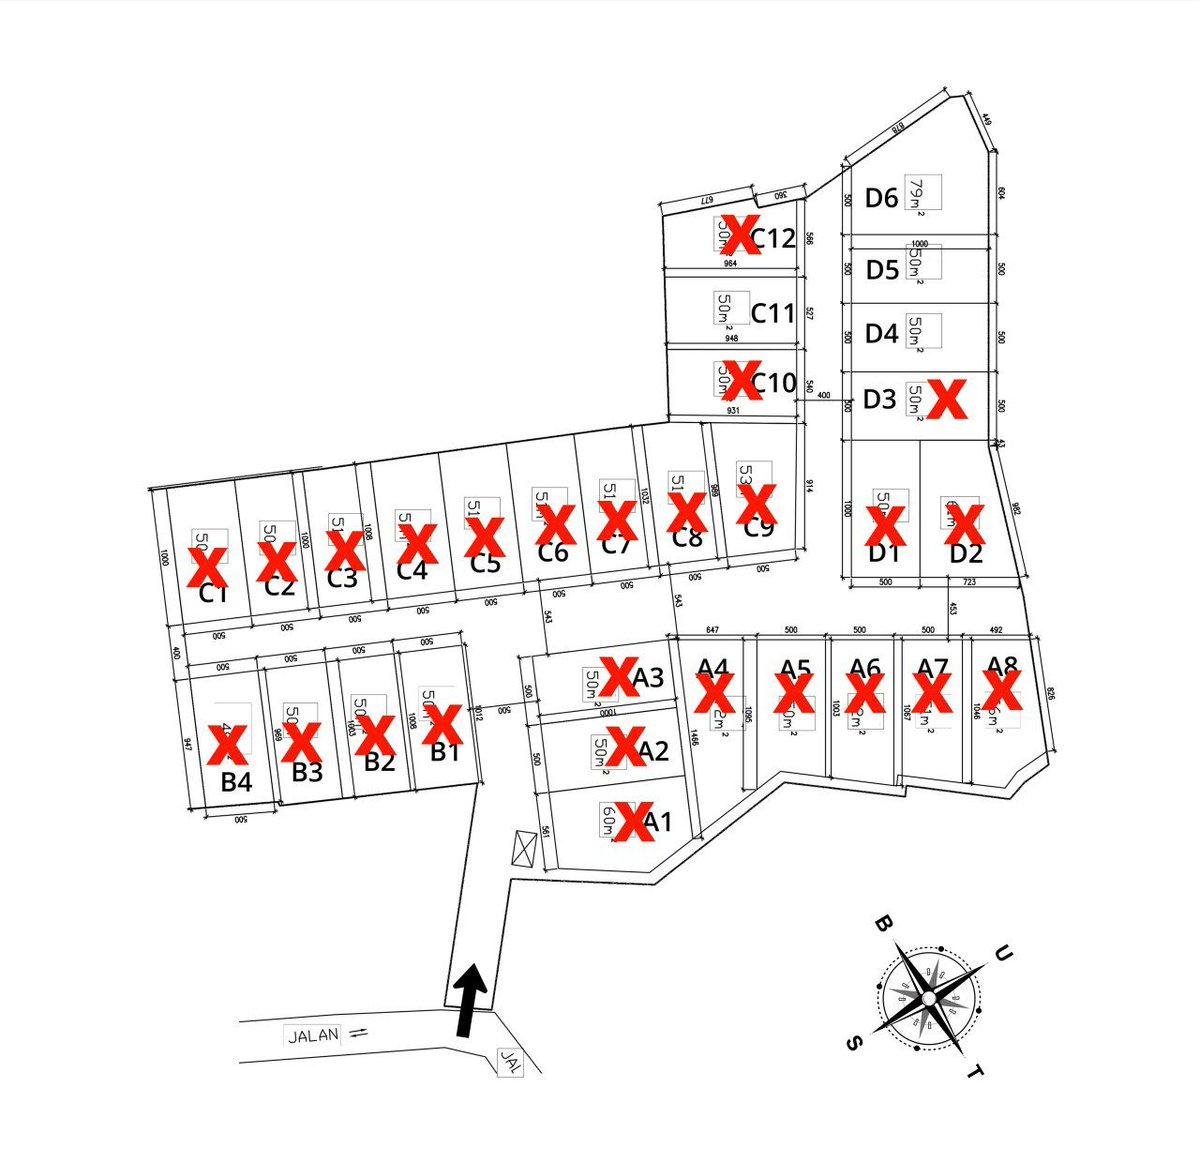 Info , Rumah 2 Lantai JAKARTA TIMUR PASAR REBO 698 jutaan, 4 unit lagi TB SIMATUPANG RESIDENCE  #jakartatimur #clustersyariah #infojakarta #UlamaDukungDespi #dirumahaja #bogor #tangerang #rumah #muslim#JanganKriminalkanDakwah #propertisyariah  #rumahdijual #cakung https://t.co/xc3e98DNWH